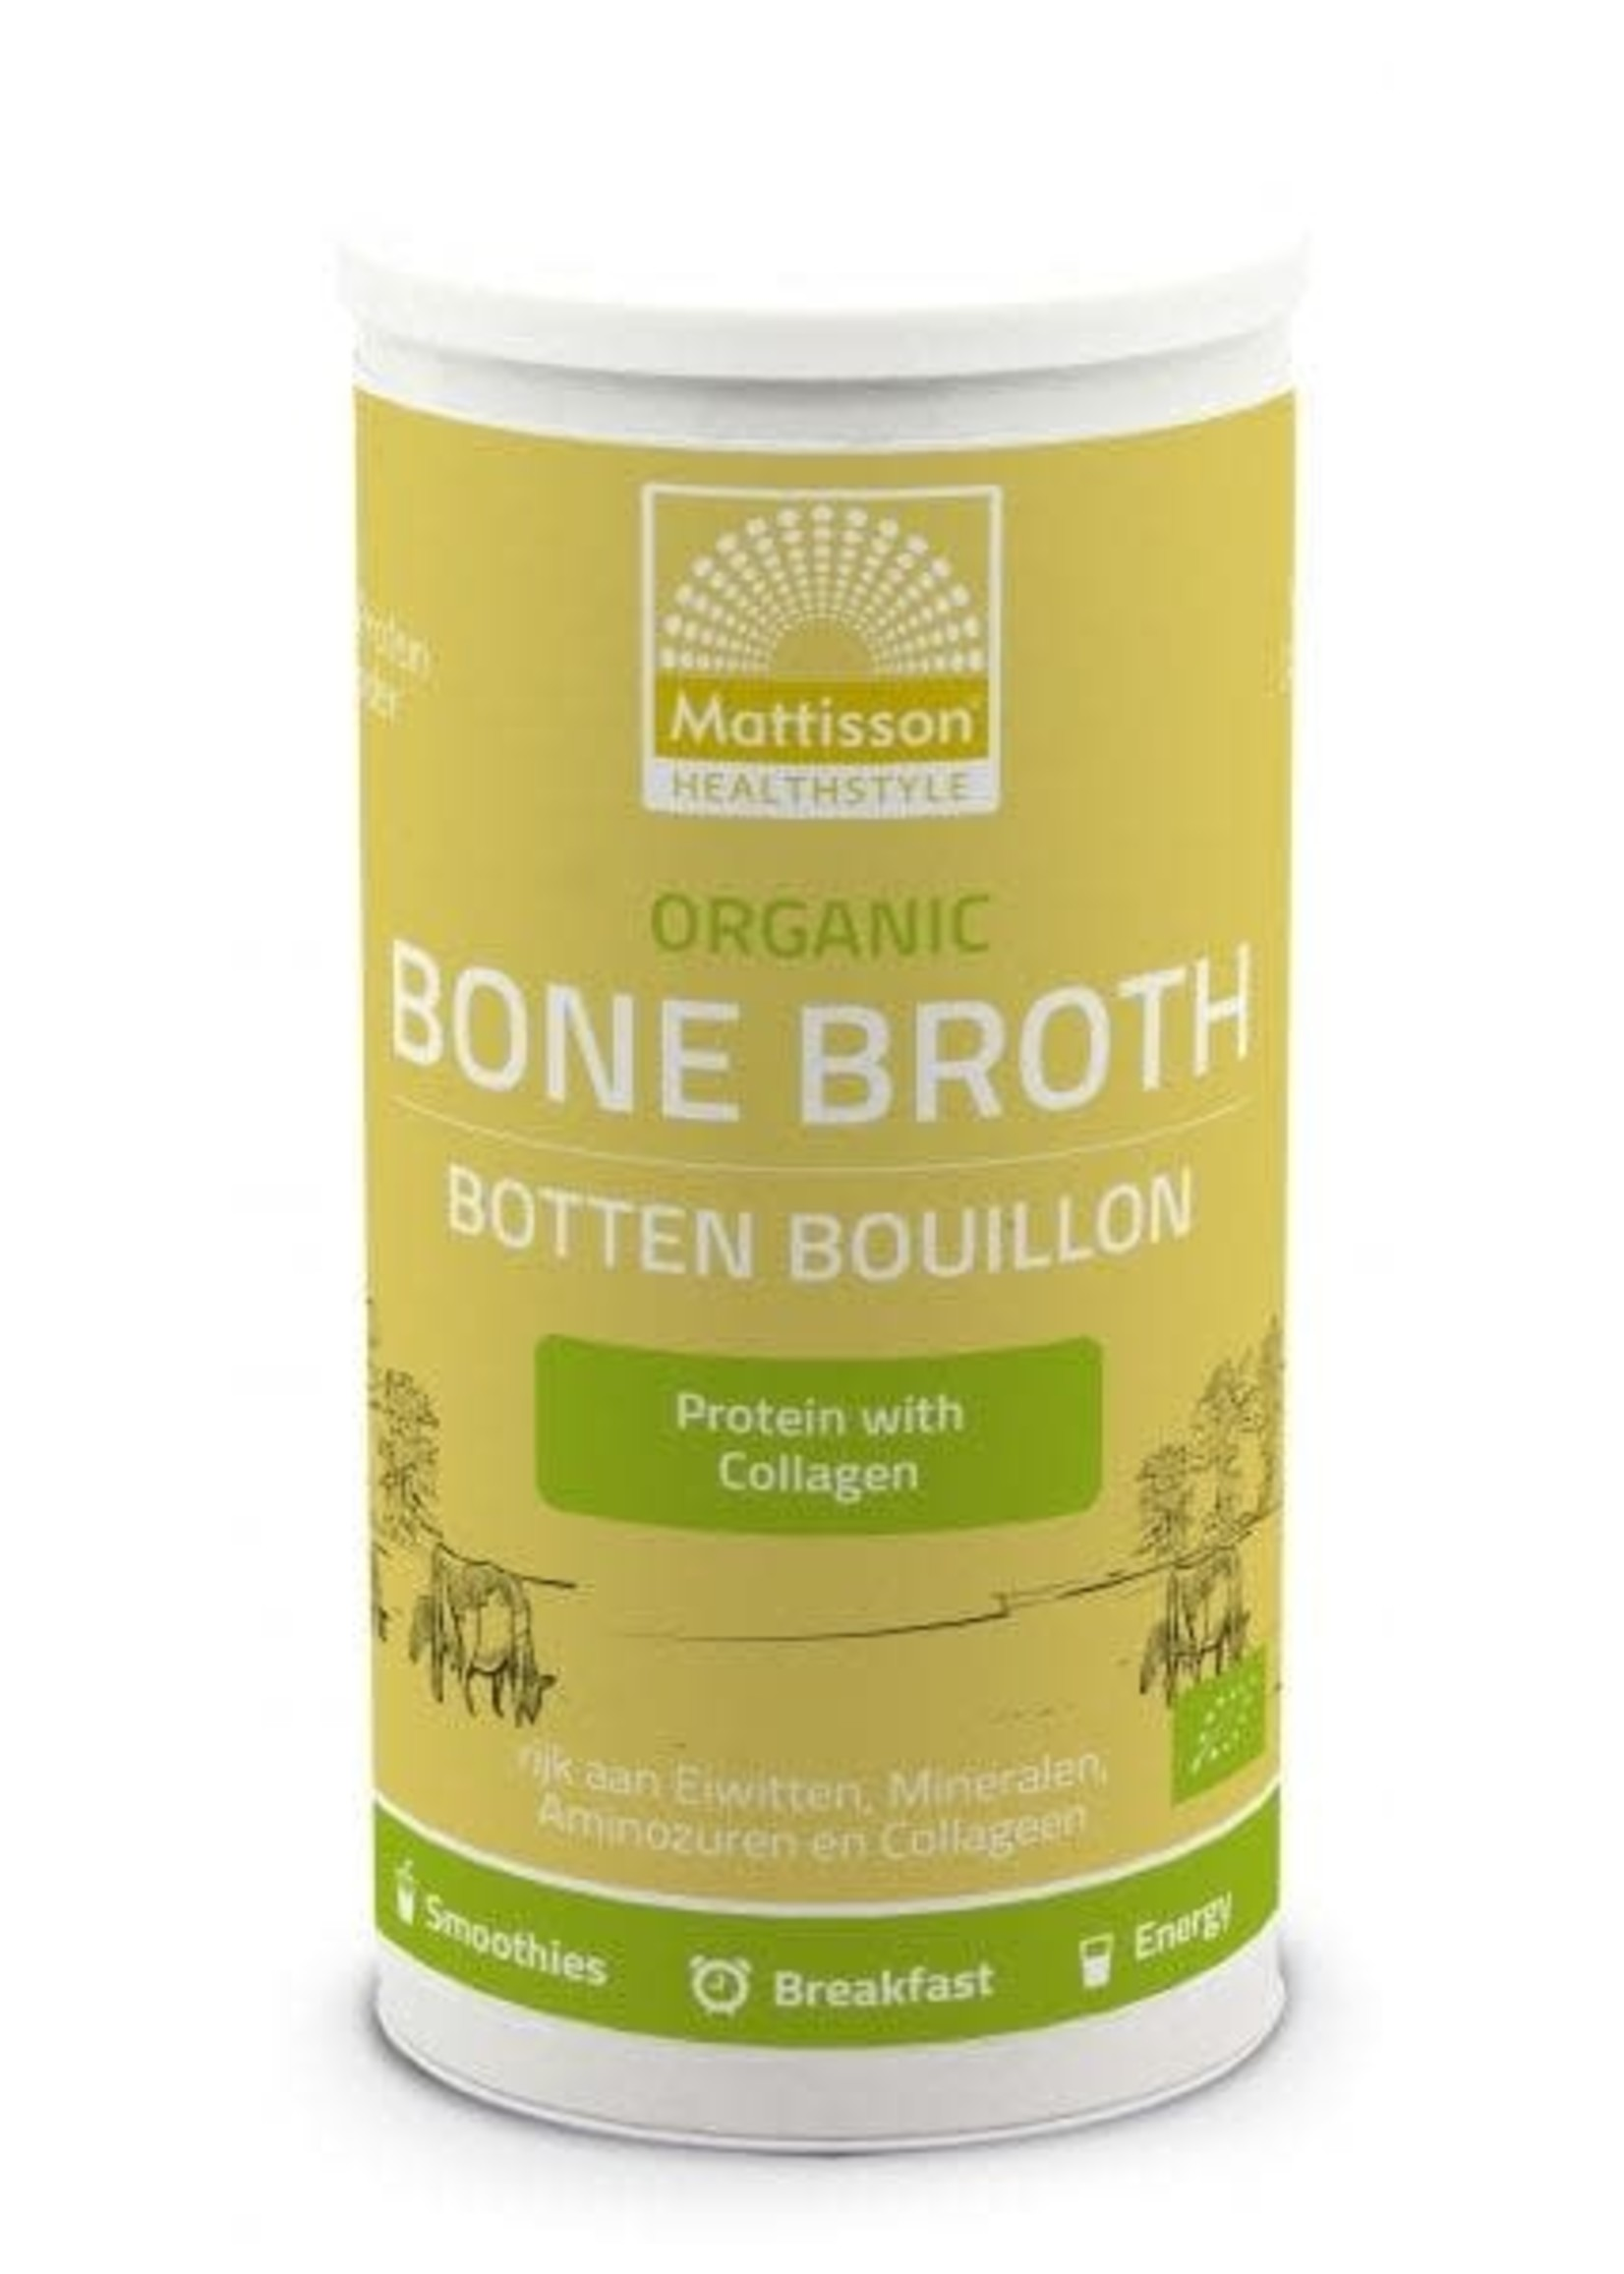 Mattisson Organic Bone Broth botten bouillon Mattisson